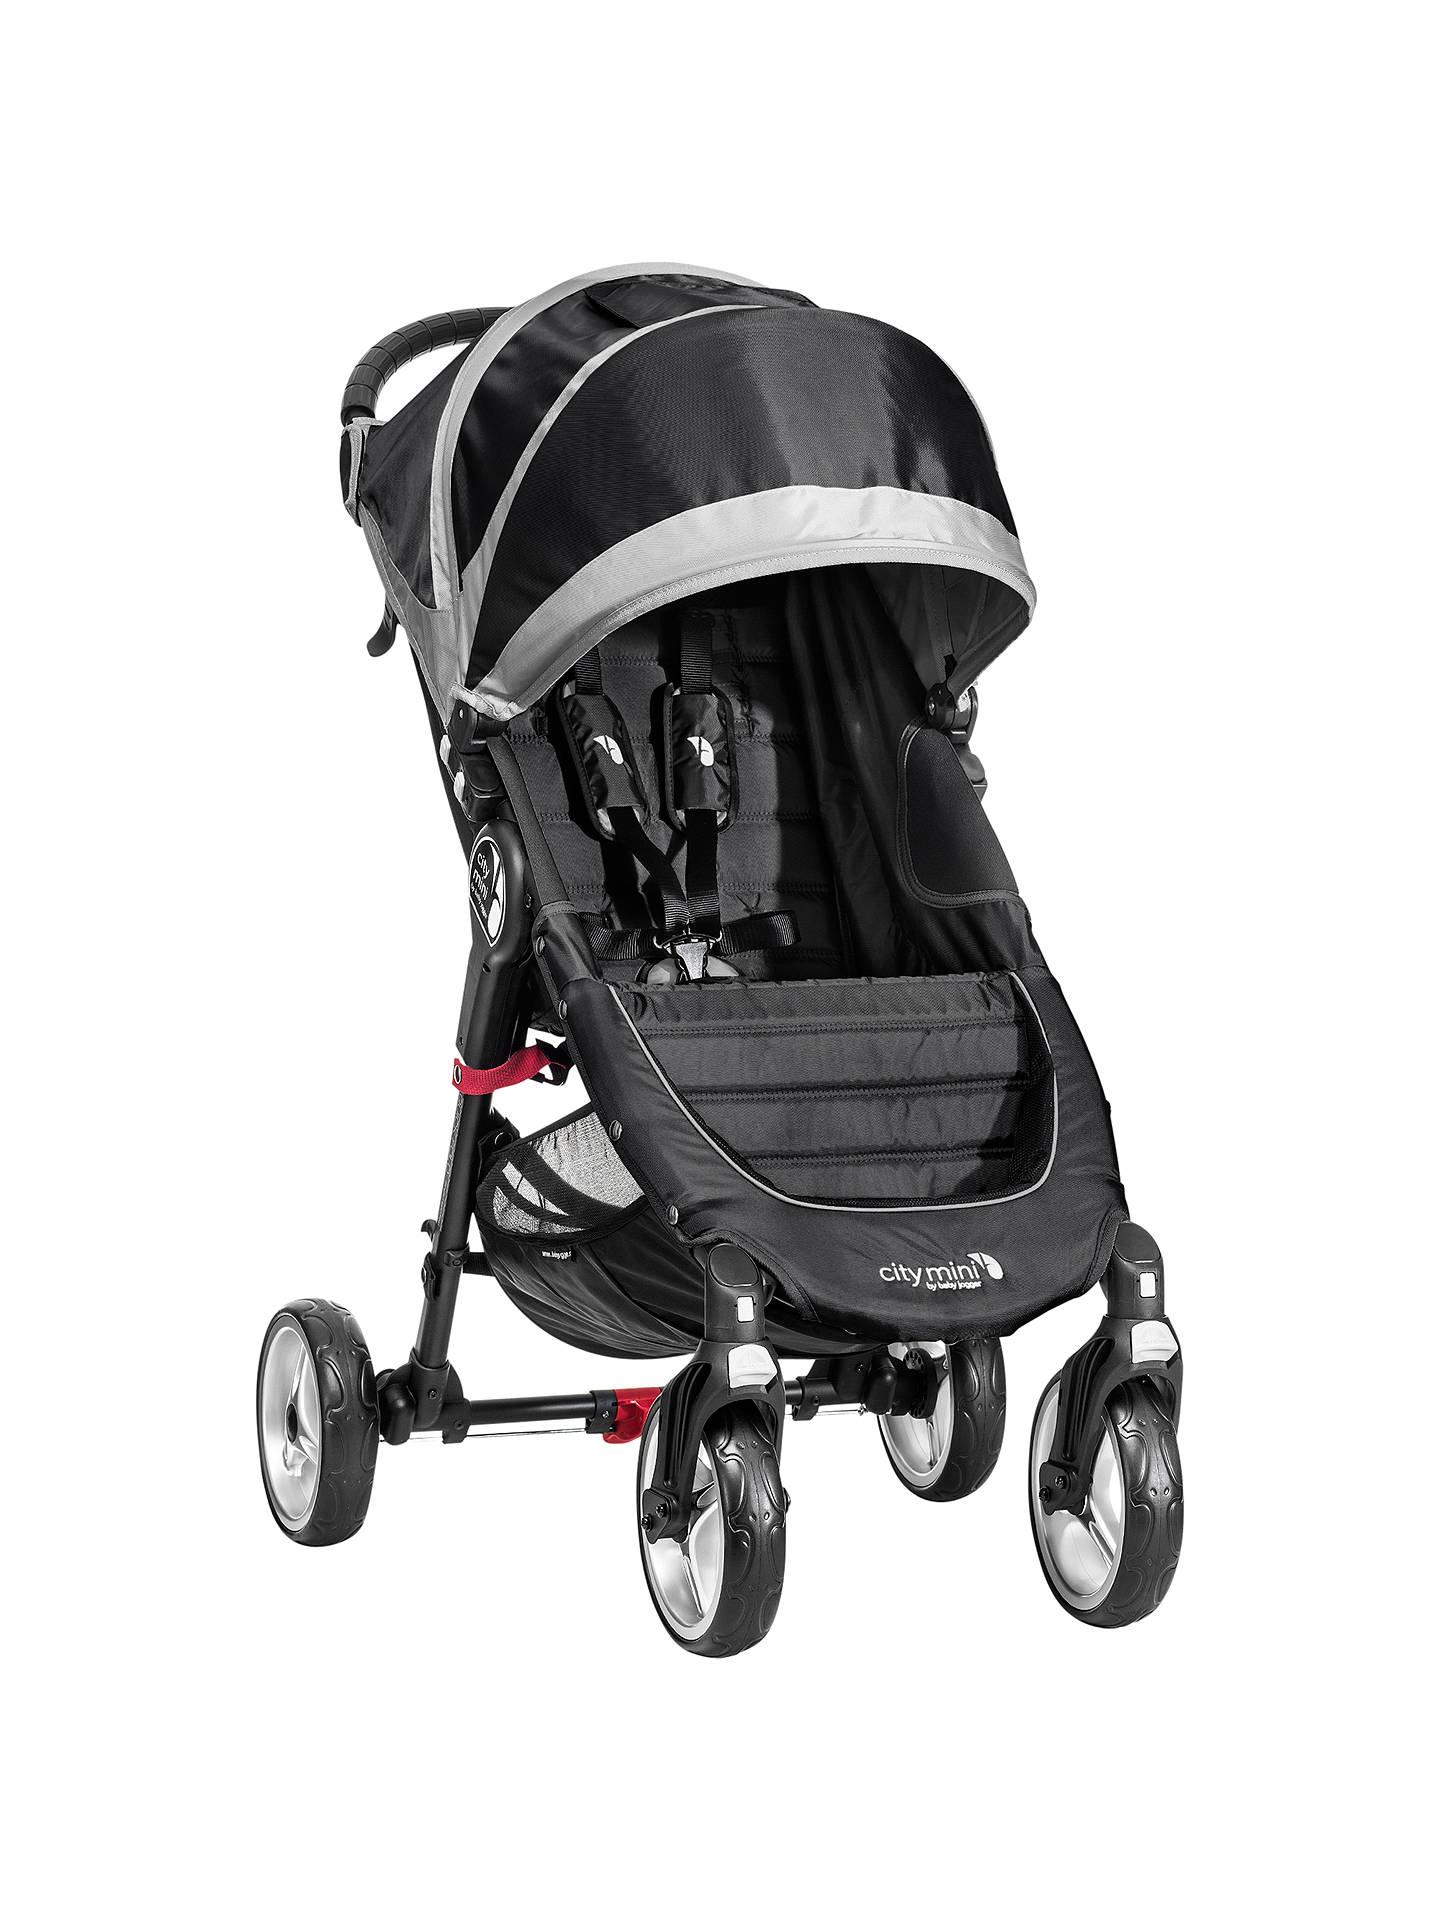 Baby Jogger City Mini 4 Wheel Pushchair Black Grey At